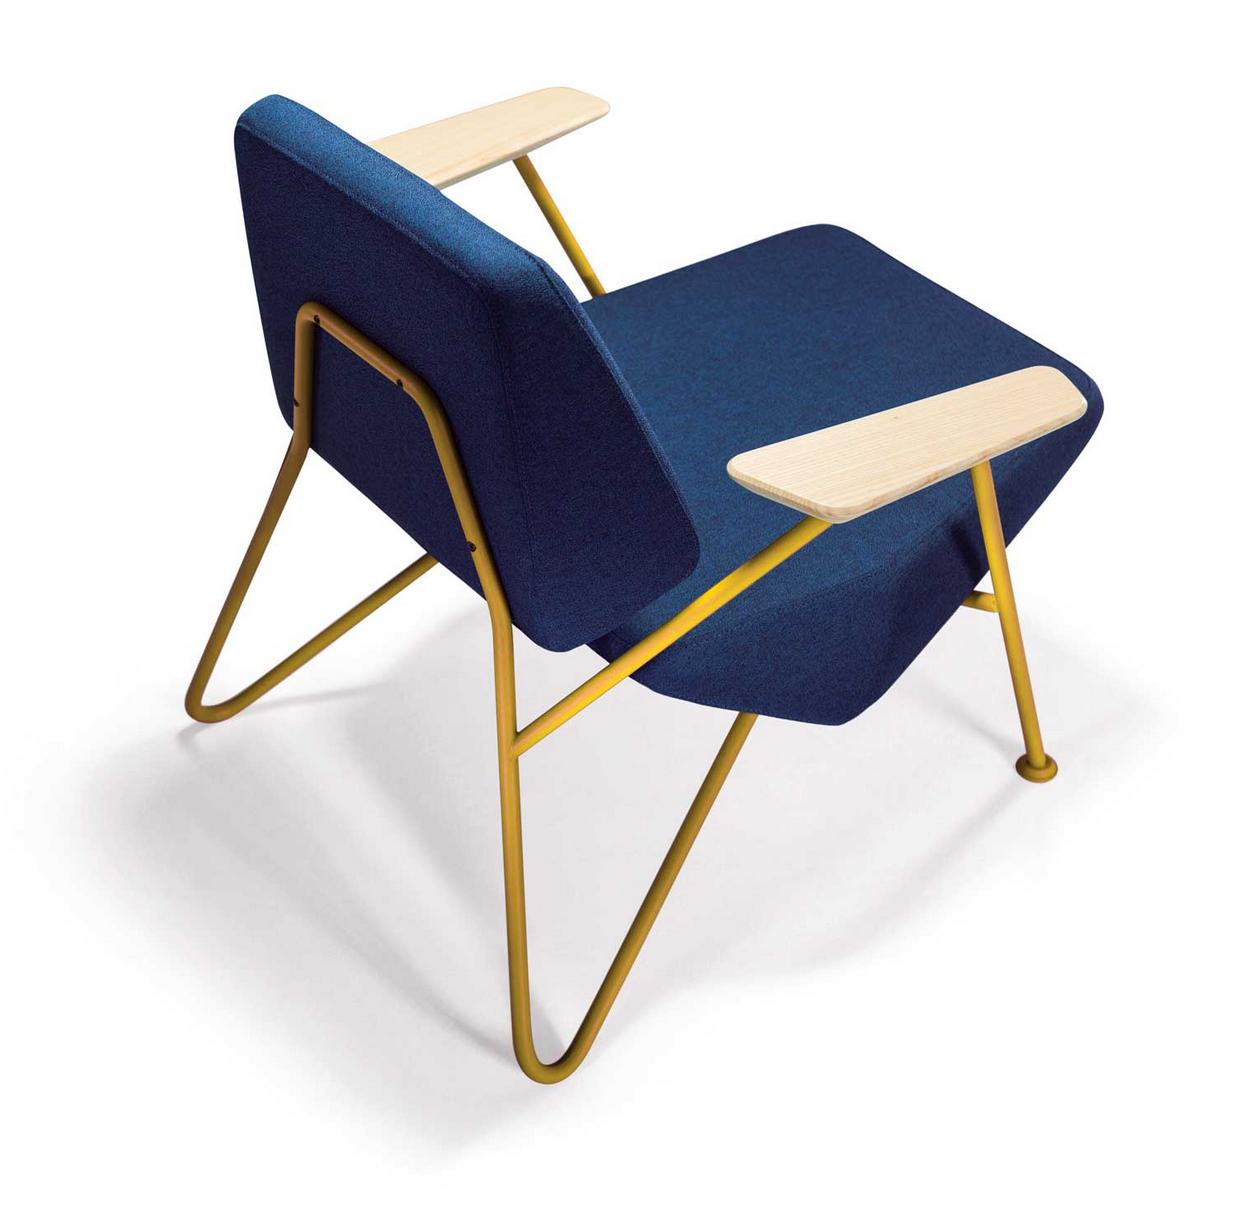 Polygon Chair By Prostoria At Superstudio Image Courtesy Of  # Muebles Laura Elda